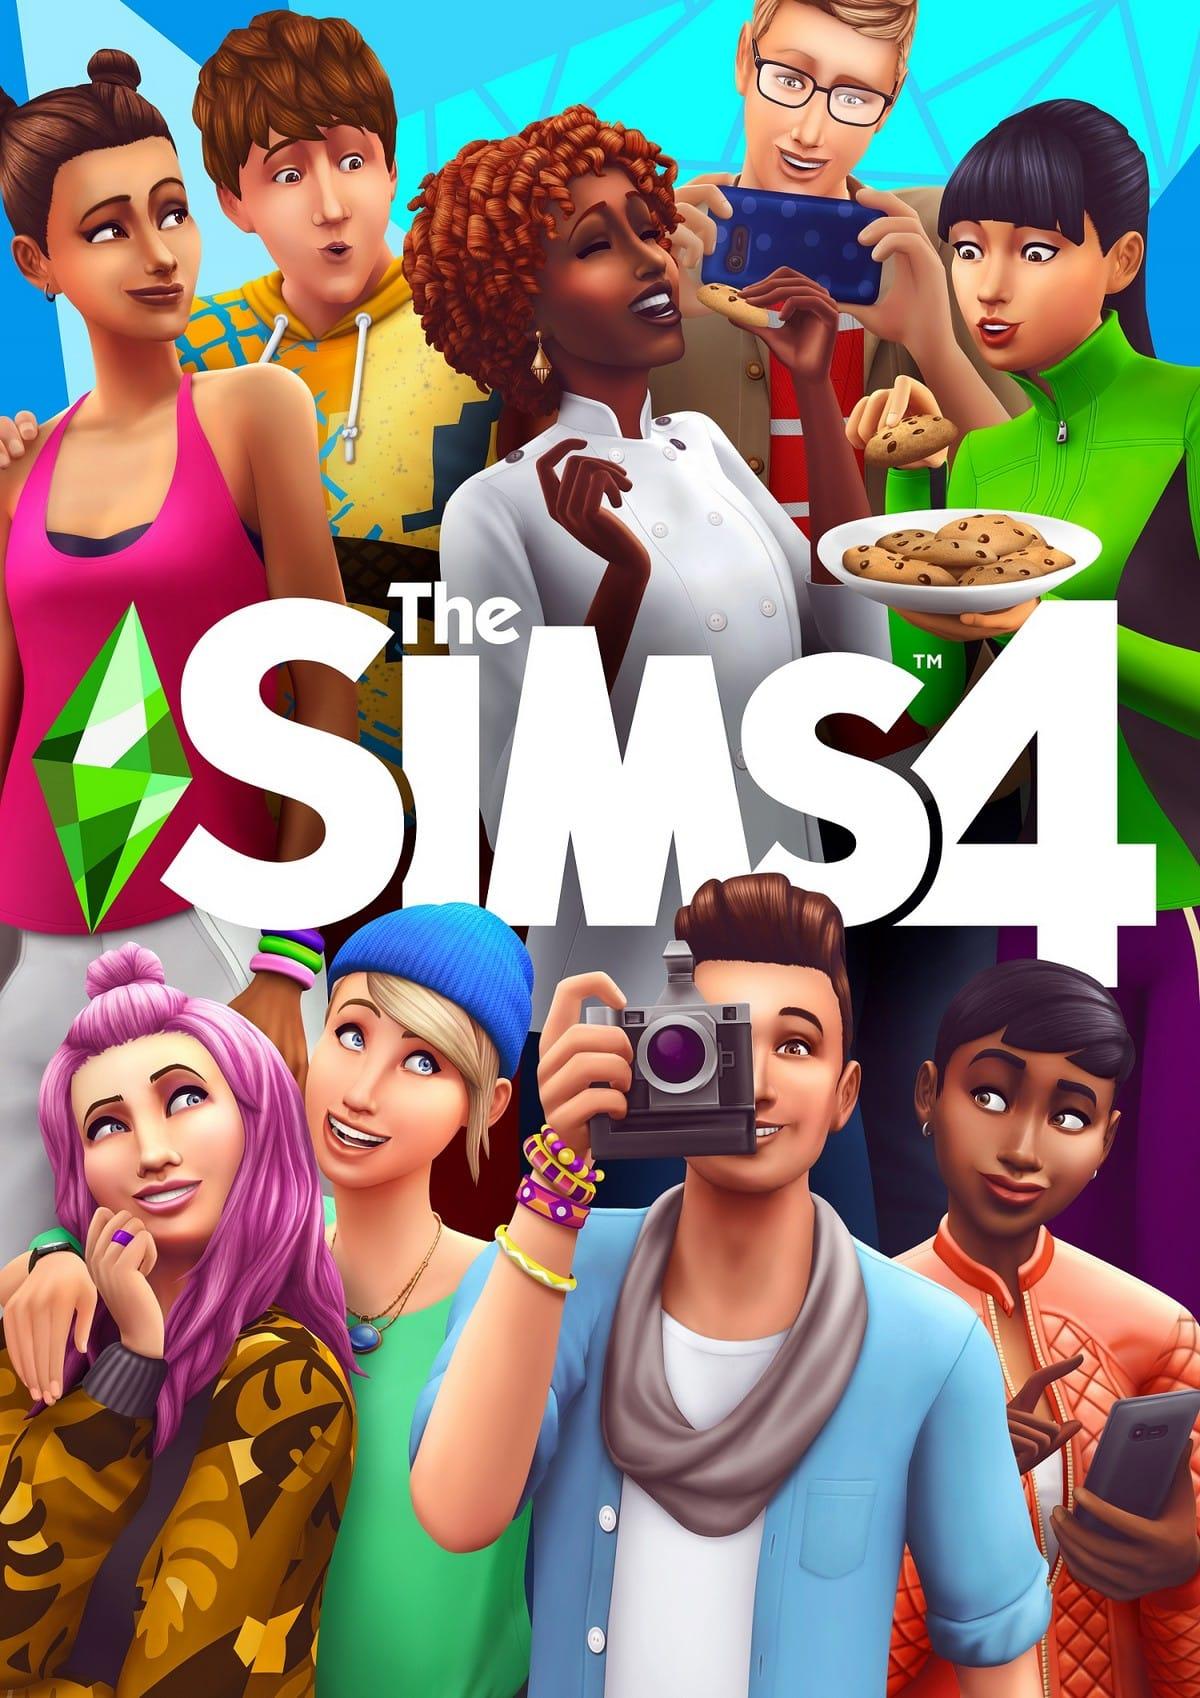 SIMS4 Main Game Key Art RGB MASTER Crop - The Sims ฉลองครบรอบ 20 ปีแห่งการเป็นเกมจำลองชีวิต